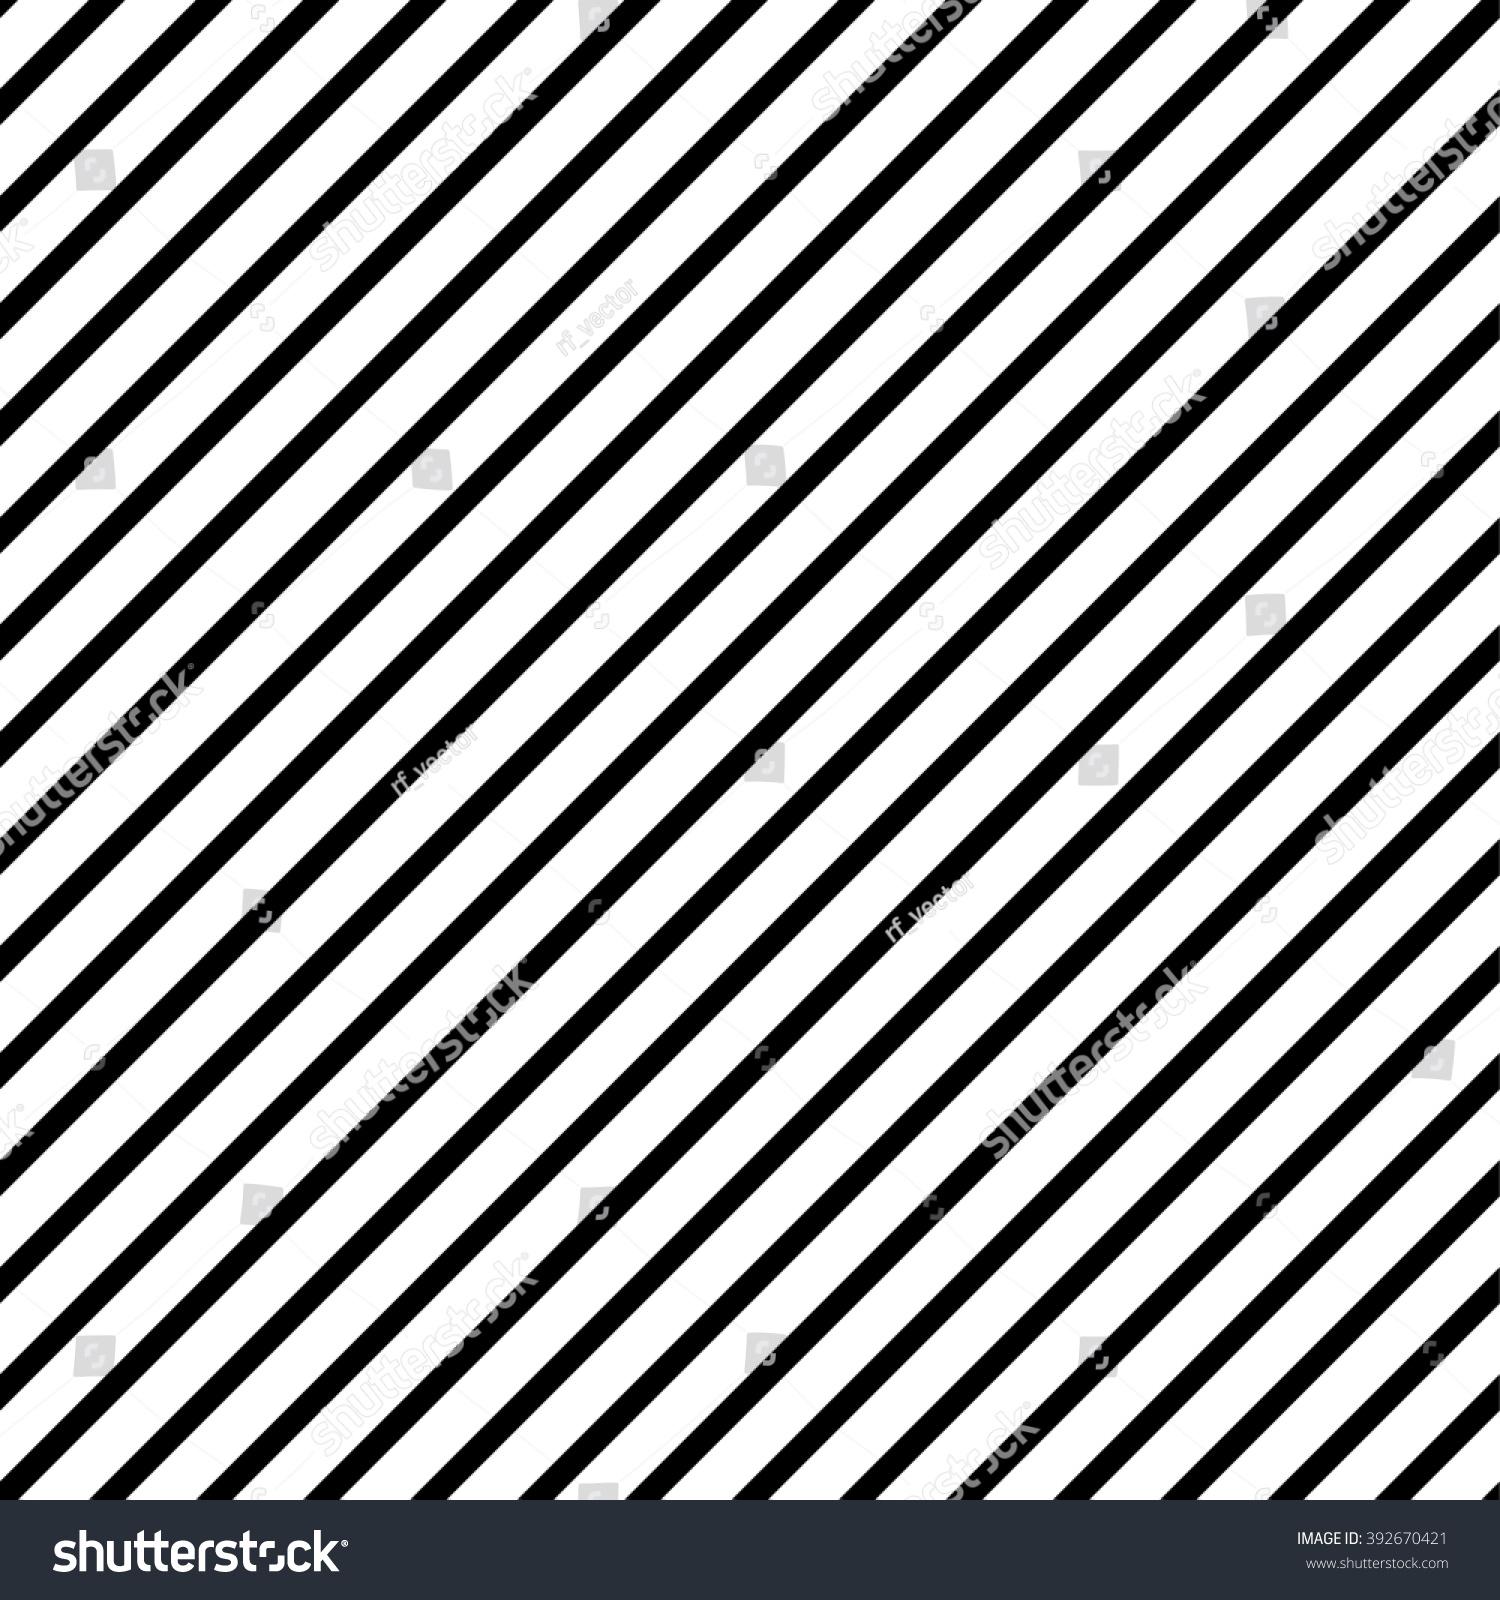 Line Texture Seamless : Seamless repeatable geometric pattern diagonal lines stock